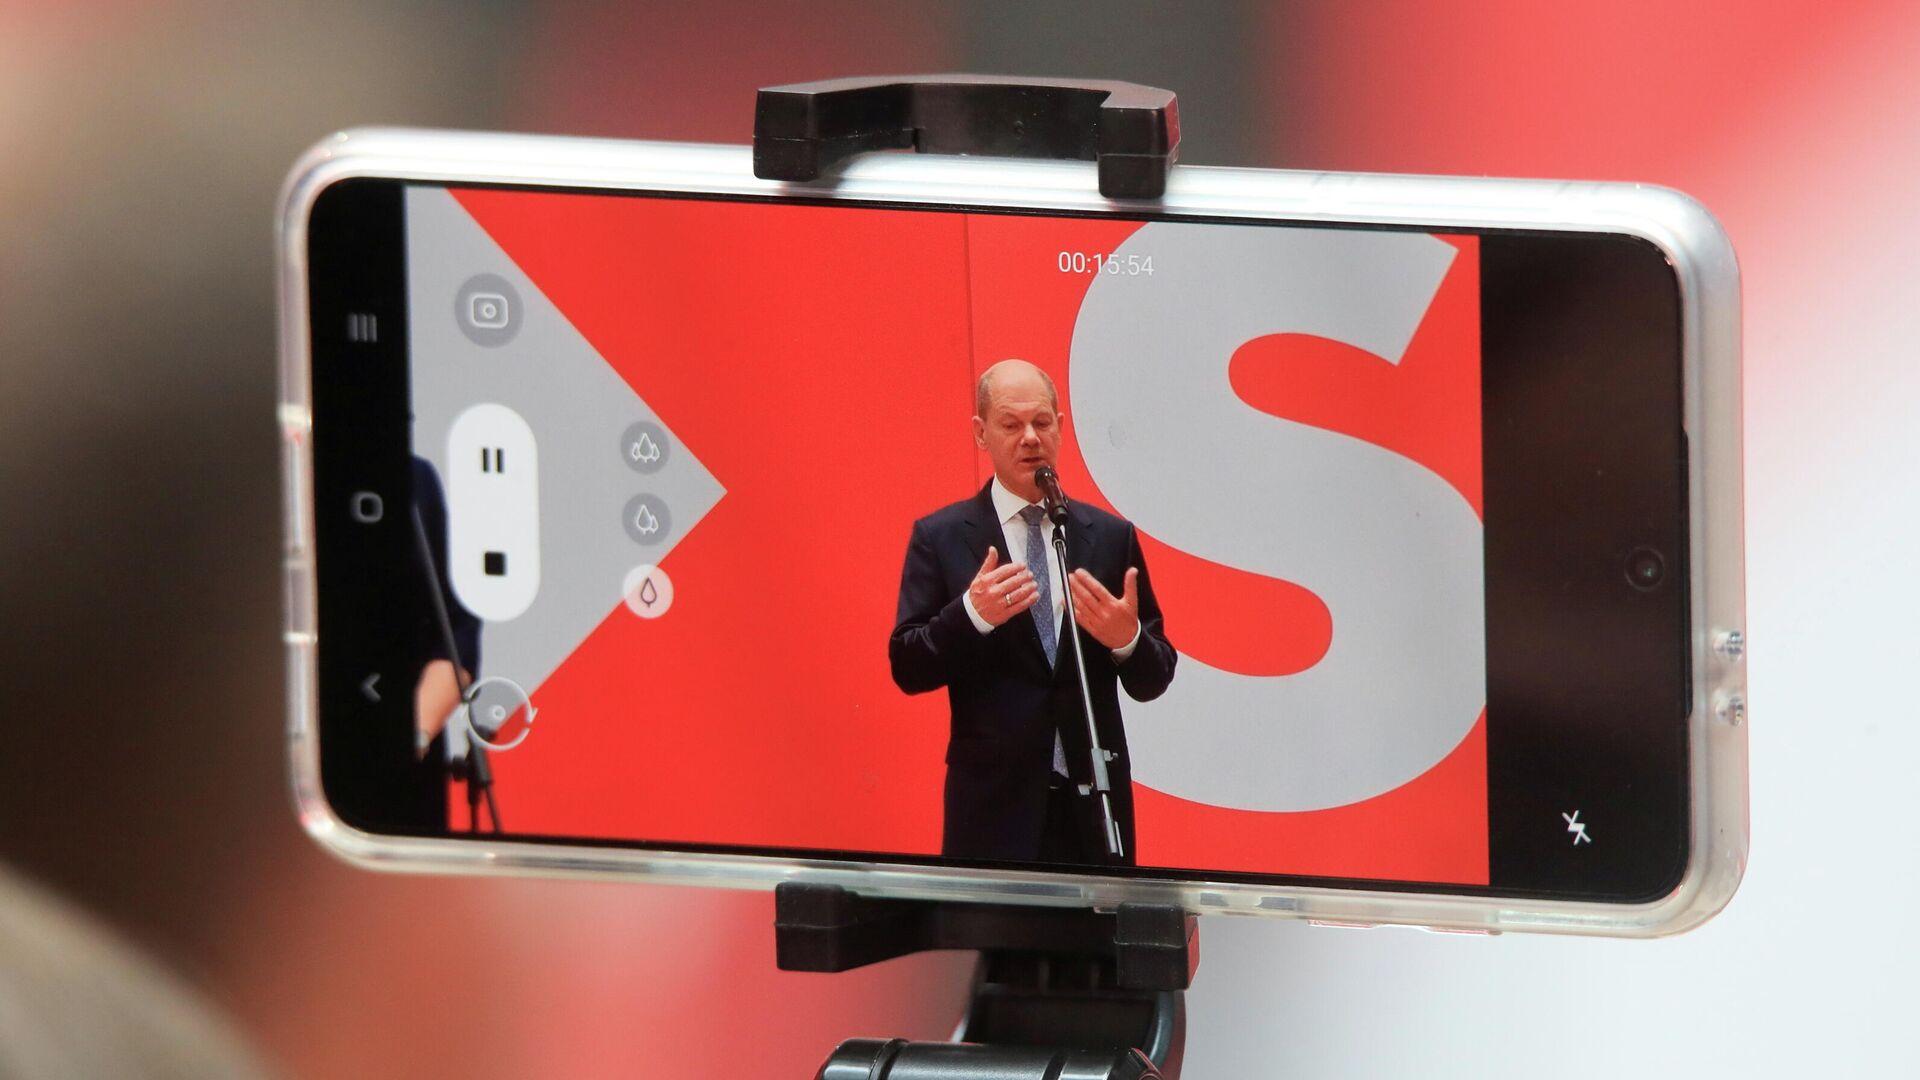 Pressekonferenz von Olaf Scholz (SPD) am 27. September 2021 - SNA, 1920, 27.09.2021